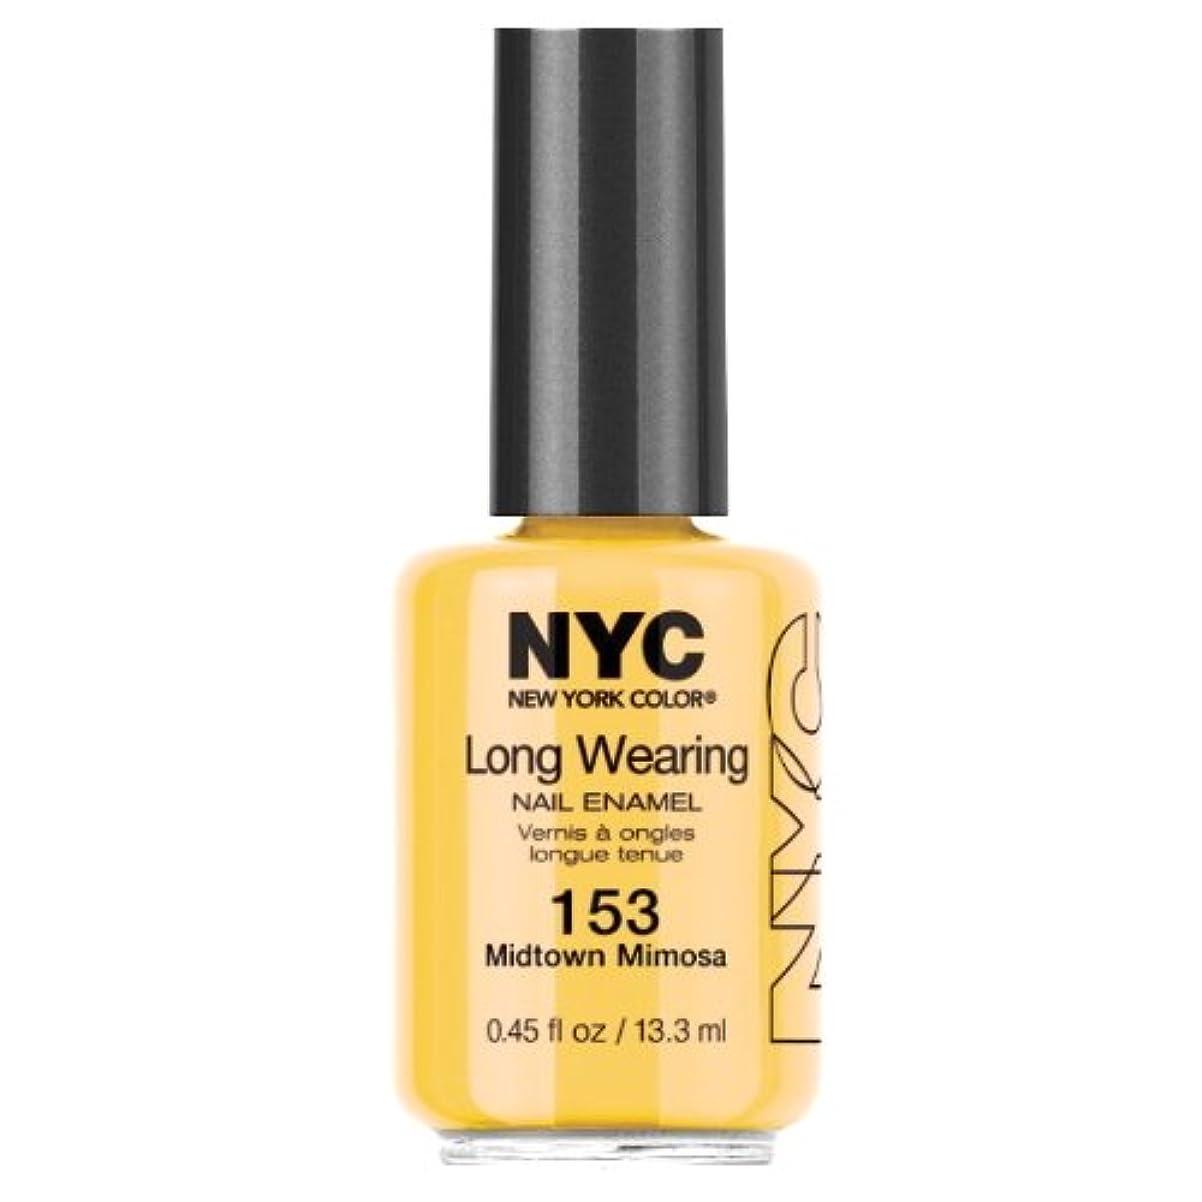 保存球体調停者NYC Long Wearing Nail Enamel - Midtown Mimosa (並行輸入品)